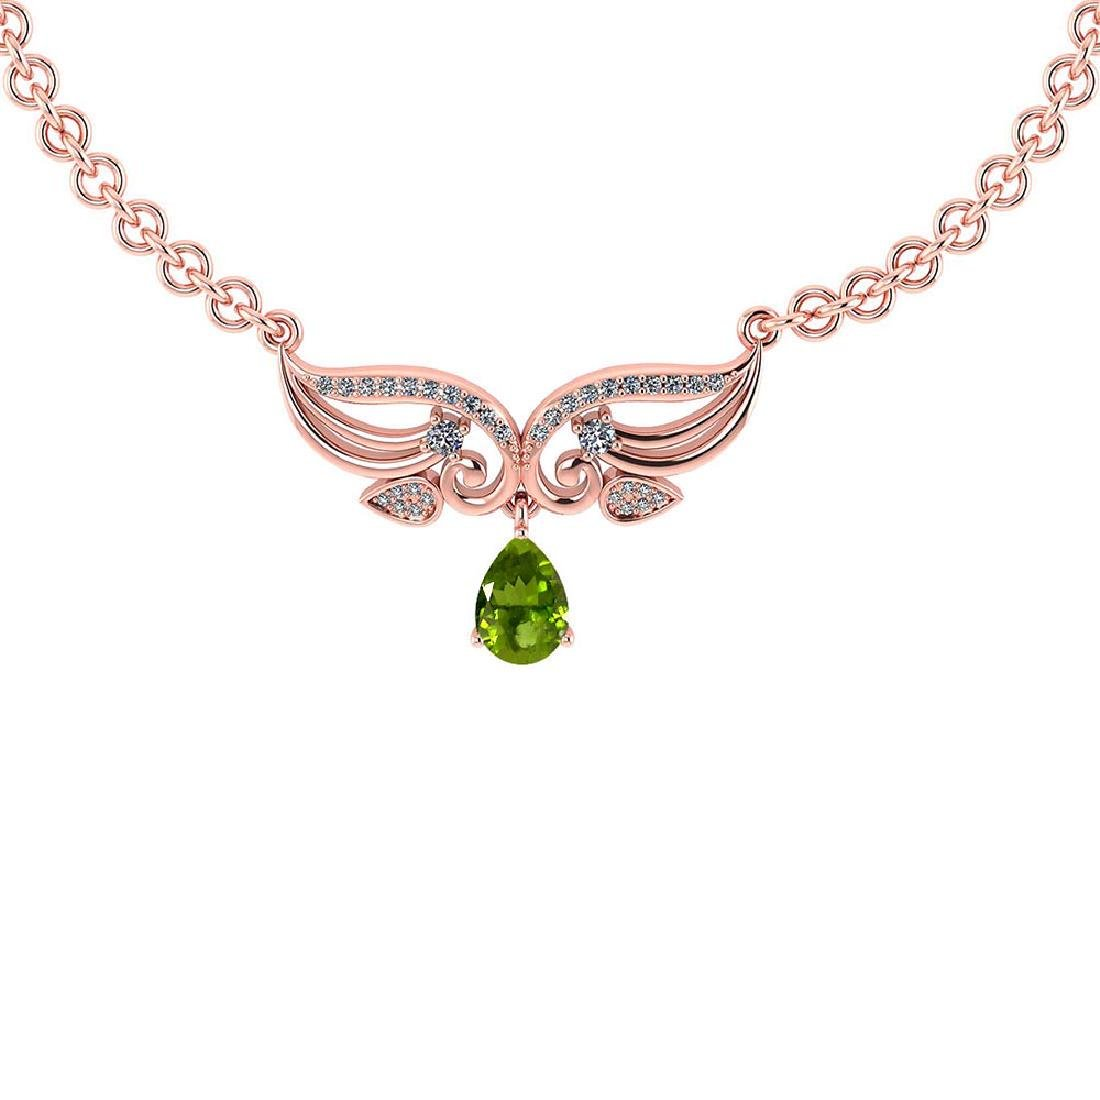 Certified 3.94 Ctw Genuine Peridot And Diamond 14k Rose